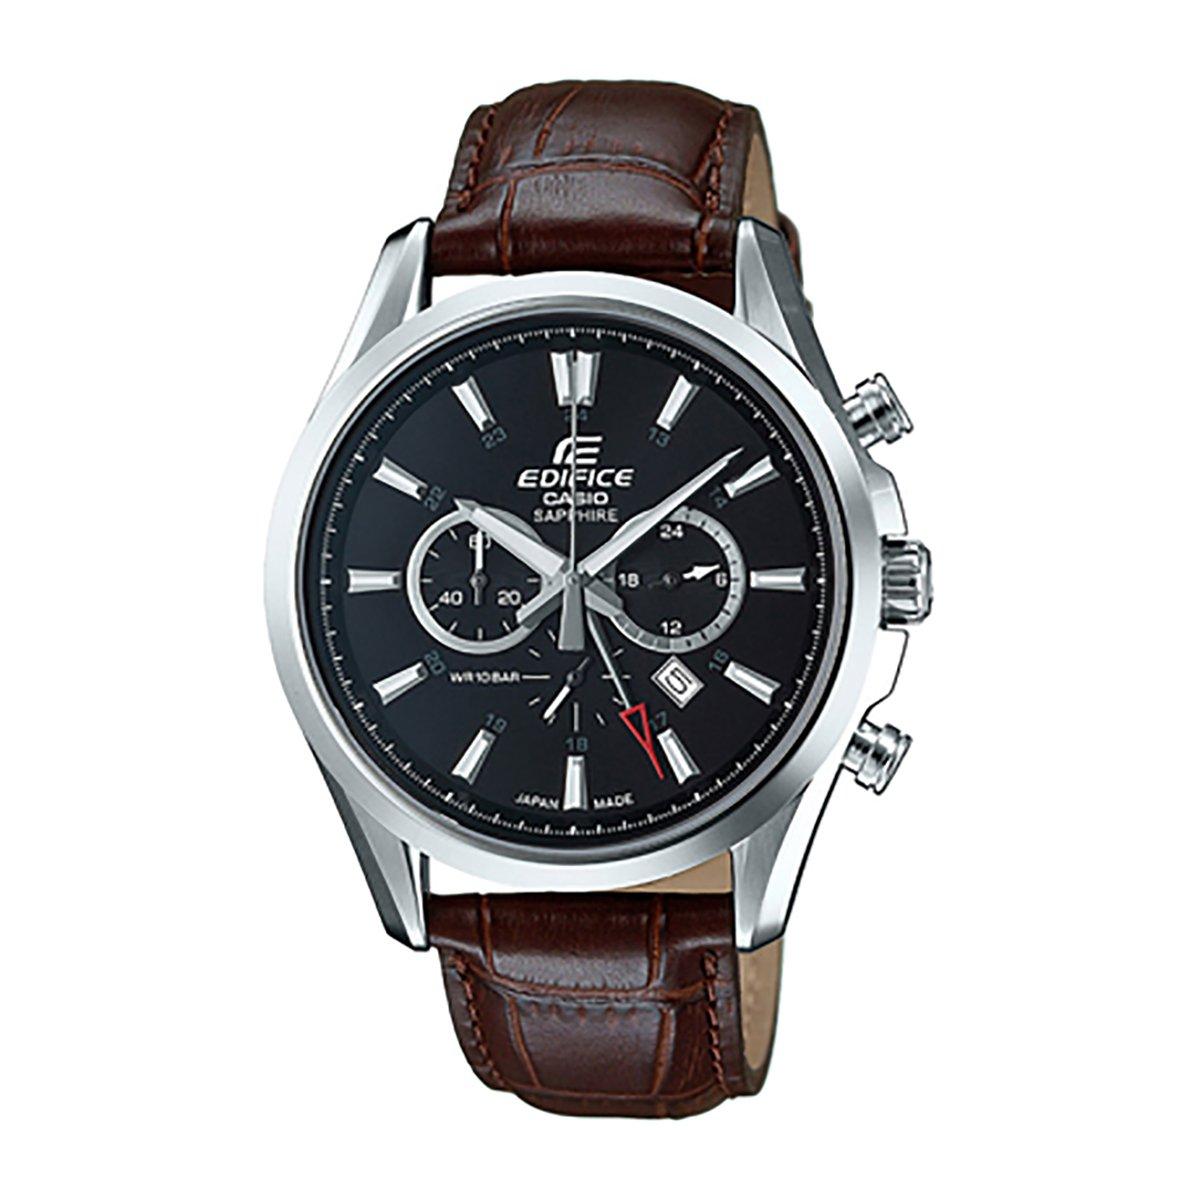 Casio Mens Edifice Analog Business Quartz Watch EFB-504JL-1A by Casio